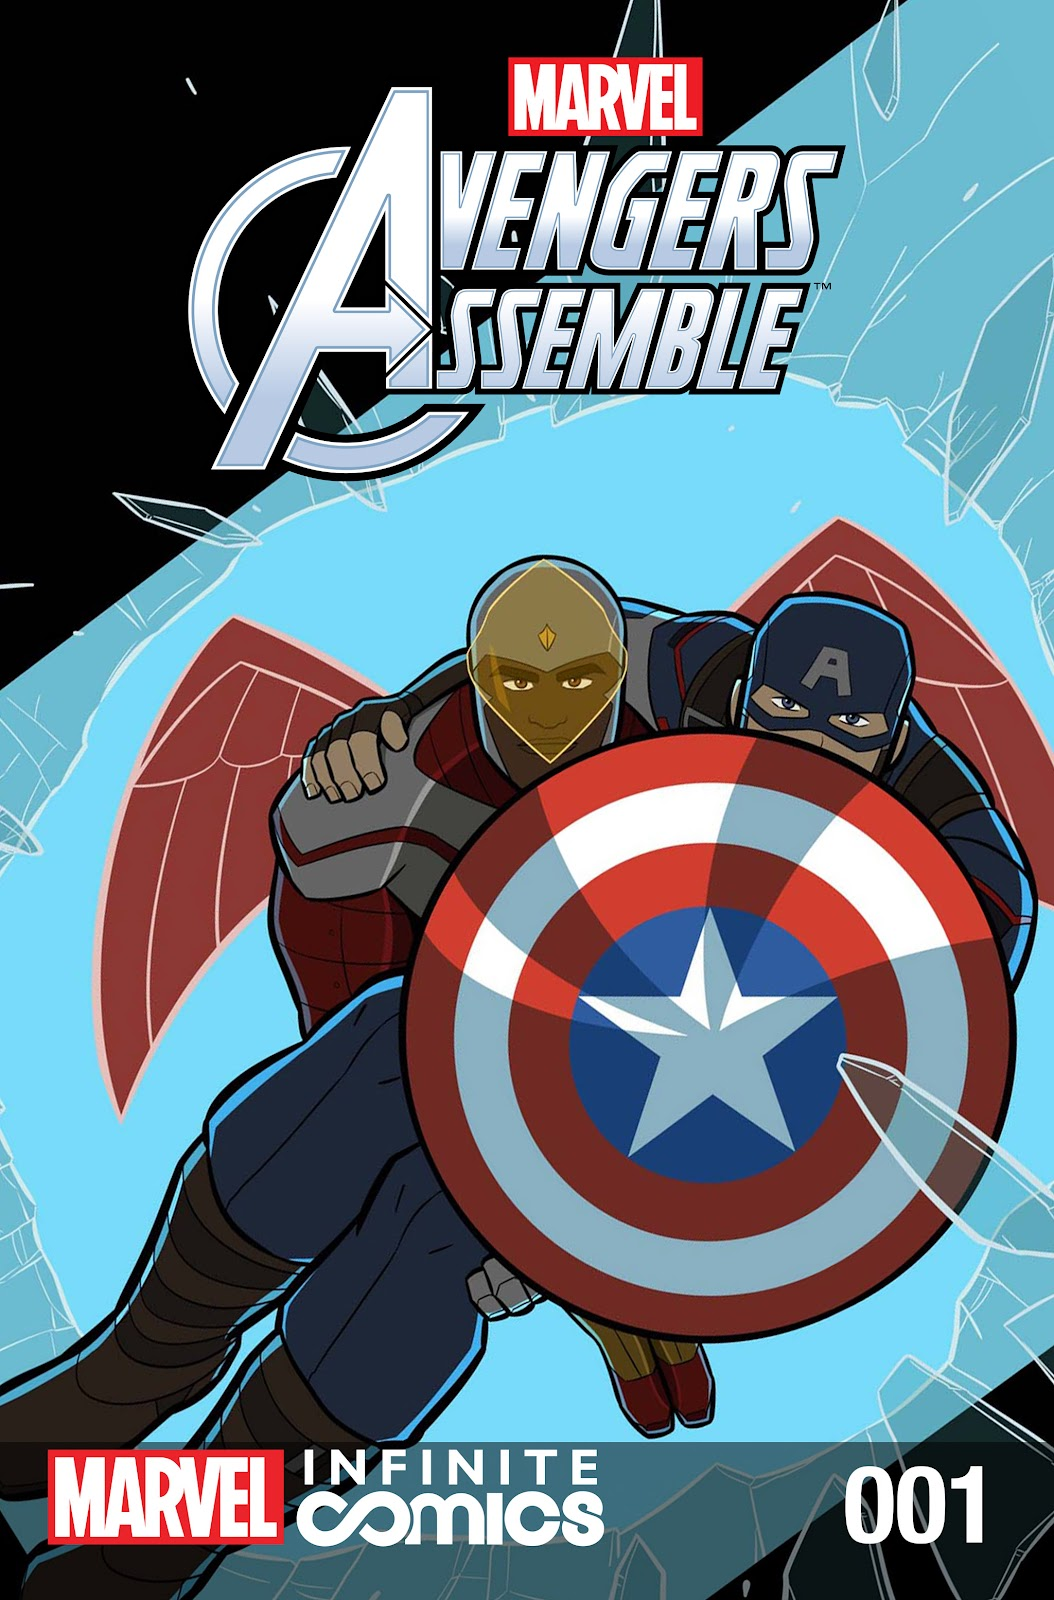 Marvel Universe Avengers Infinite Comic 1 Page 1